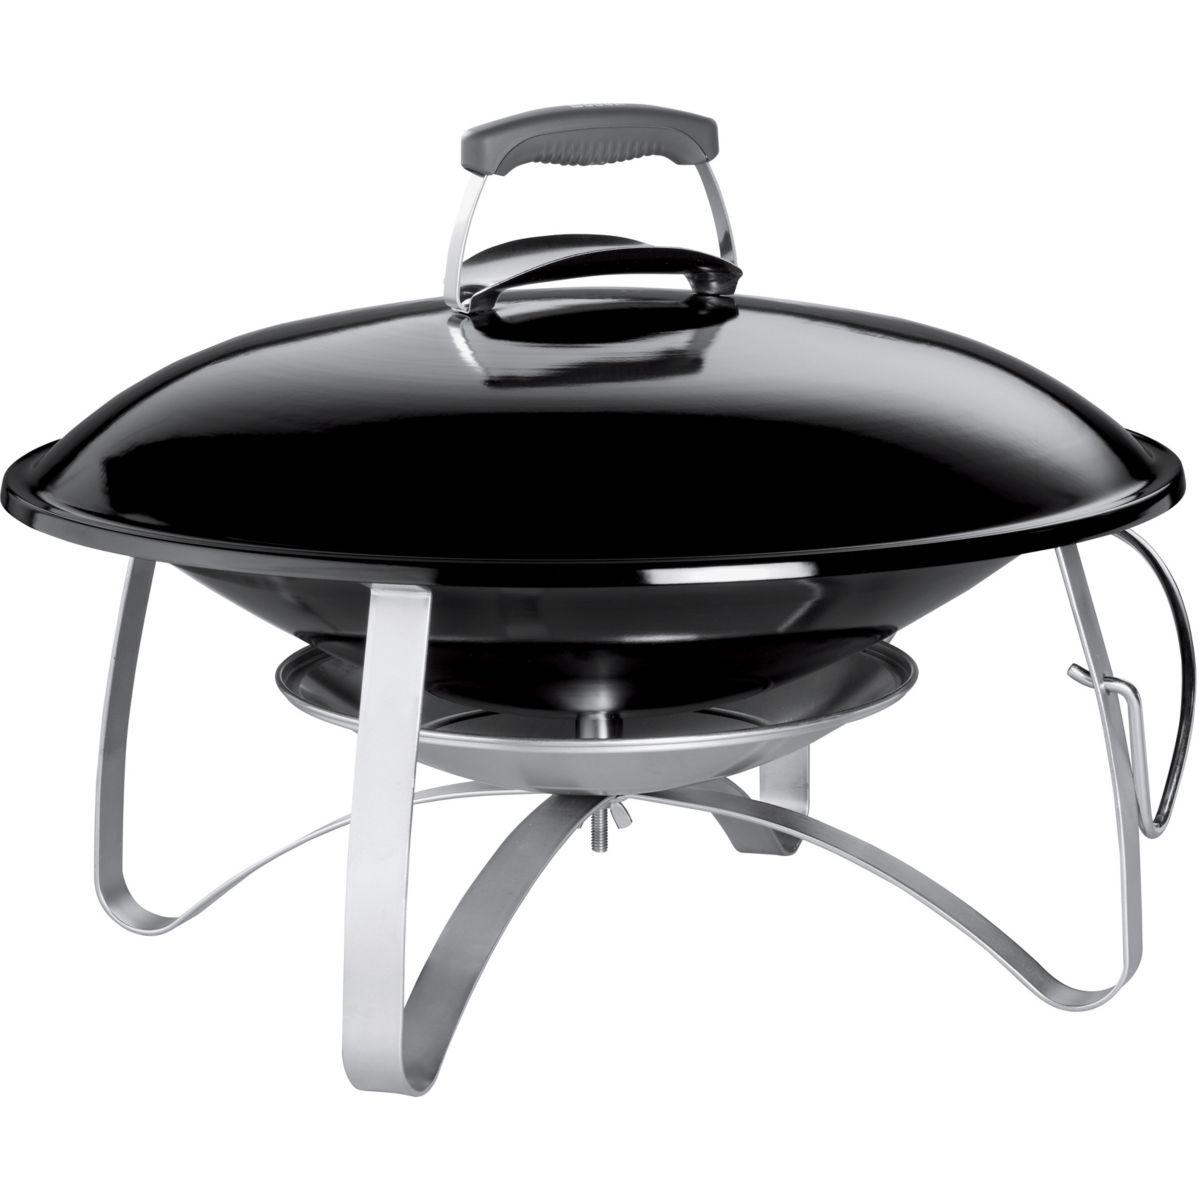 barbecue weber achat vente de barbecue pas cher. Black Bedroom Furniture Sets. Home Design Ideas